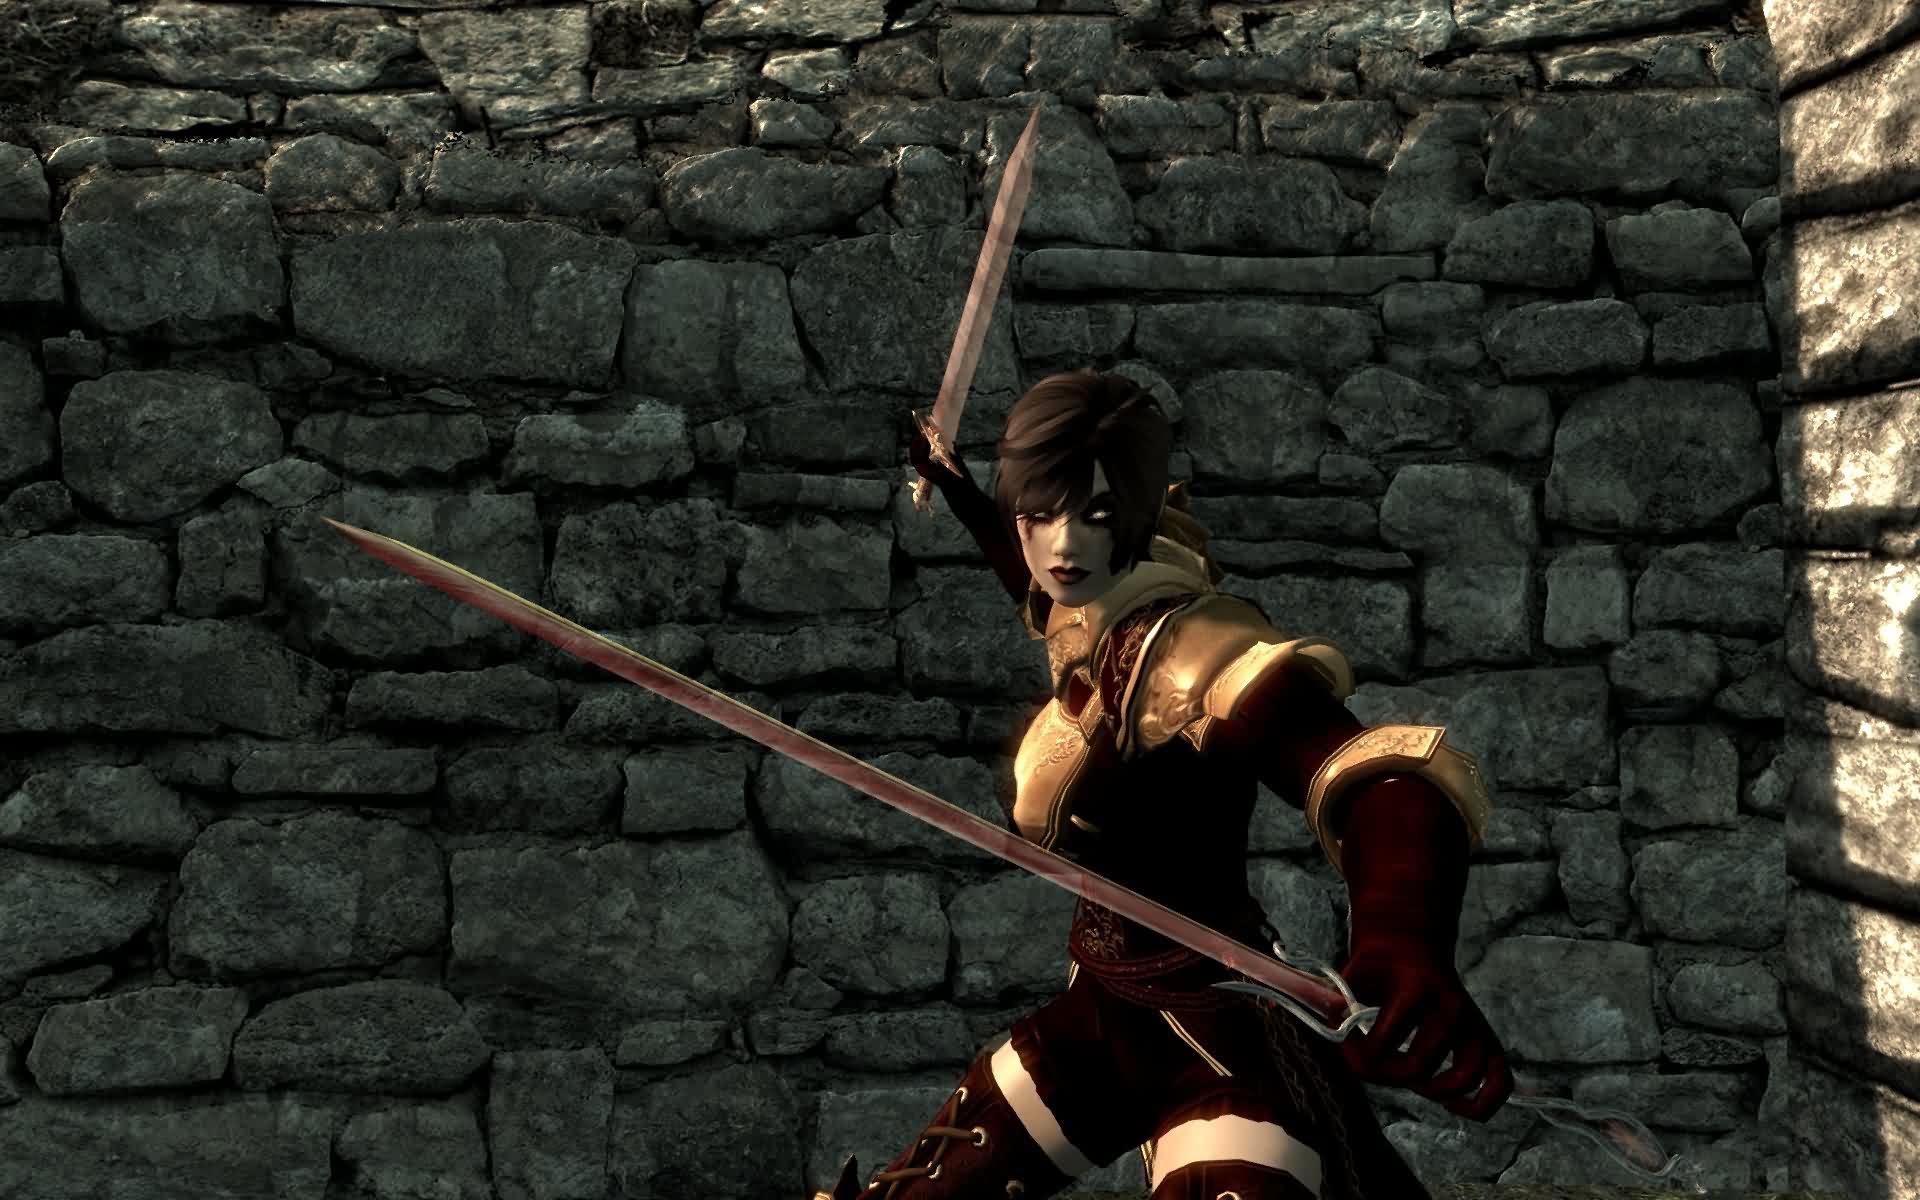 Skyrim Mod - Gizmodian Oblivion Weapons Download